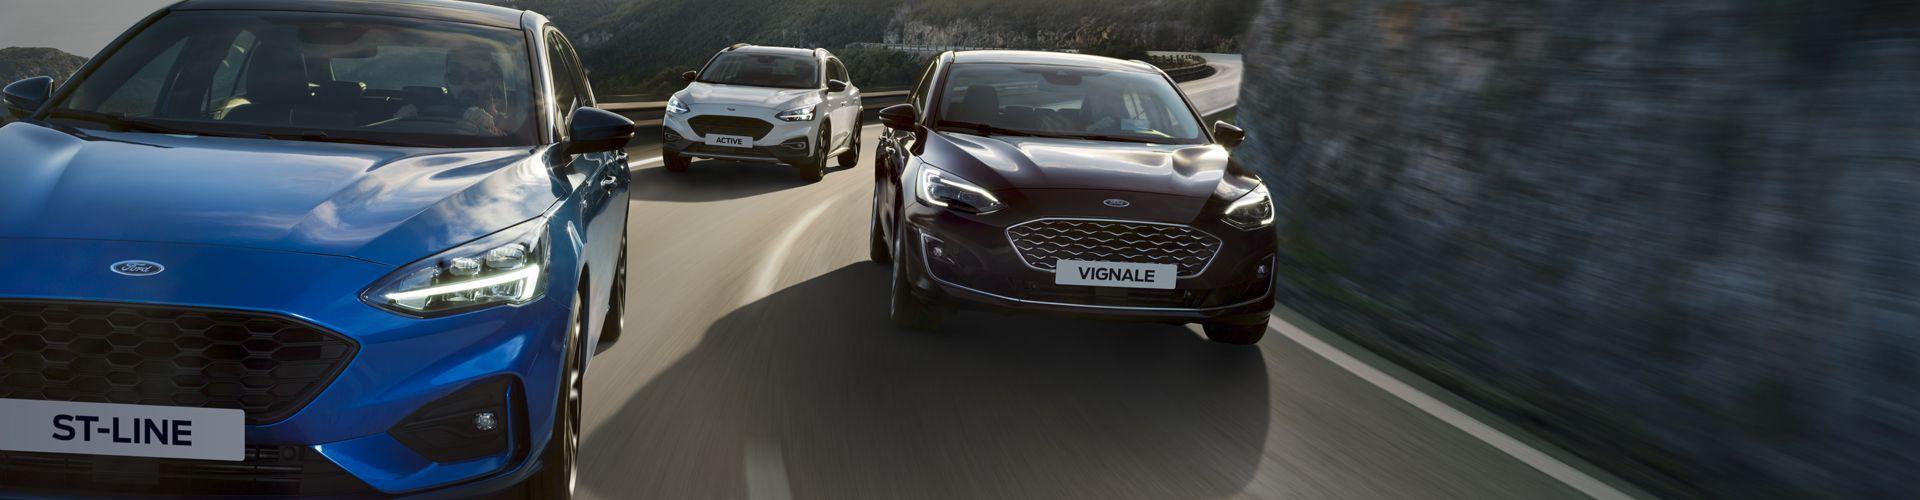 Ford Focus St Line, Vignale, Active - Αφοί Λιάπη